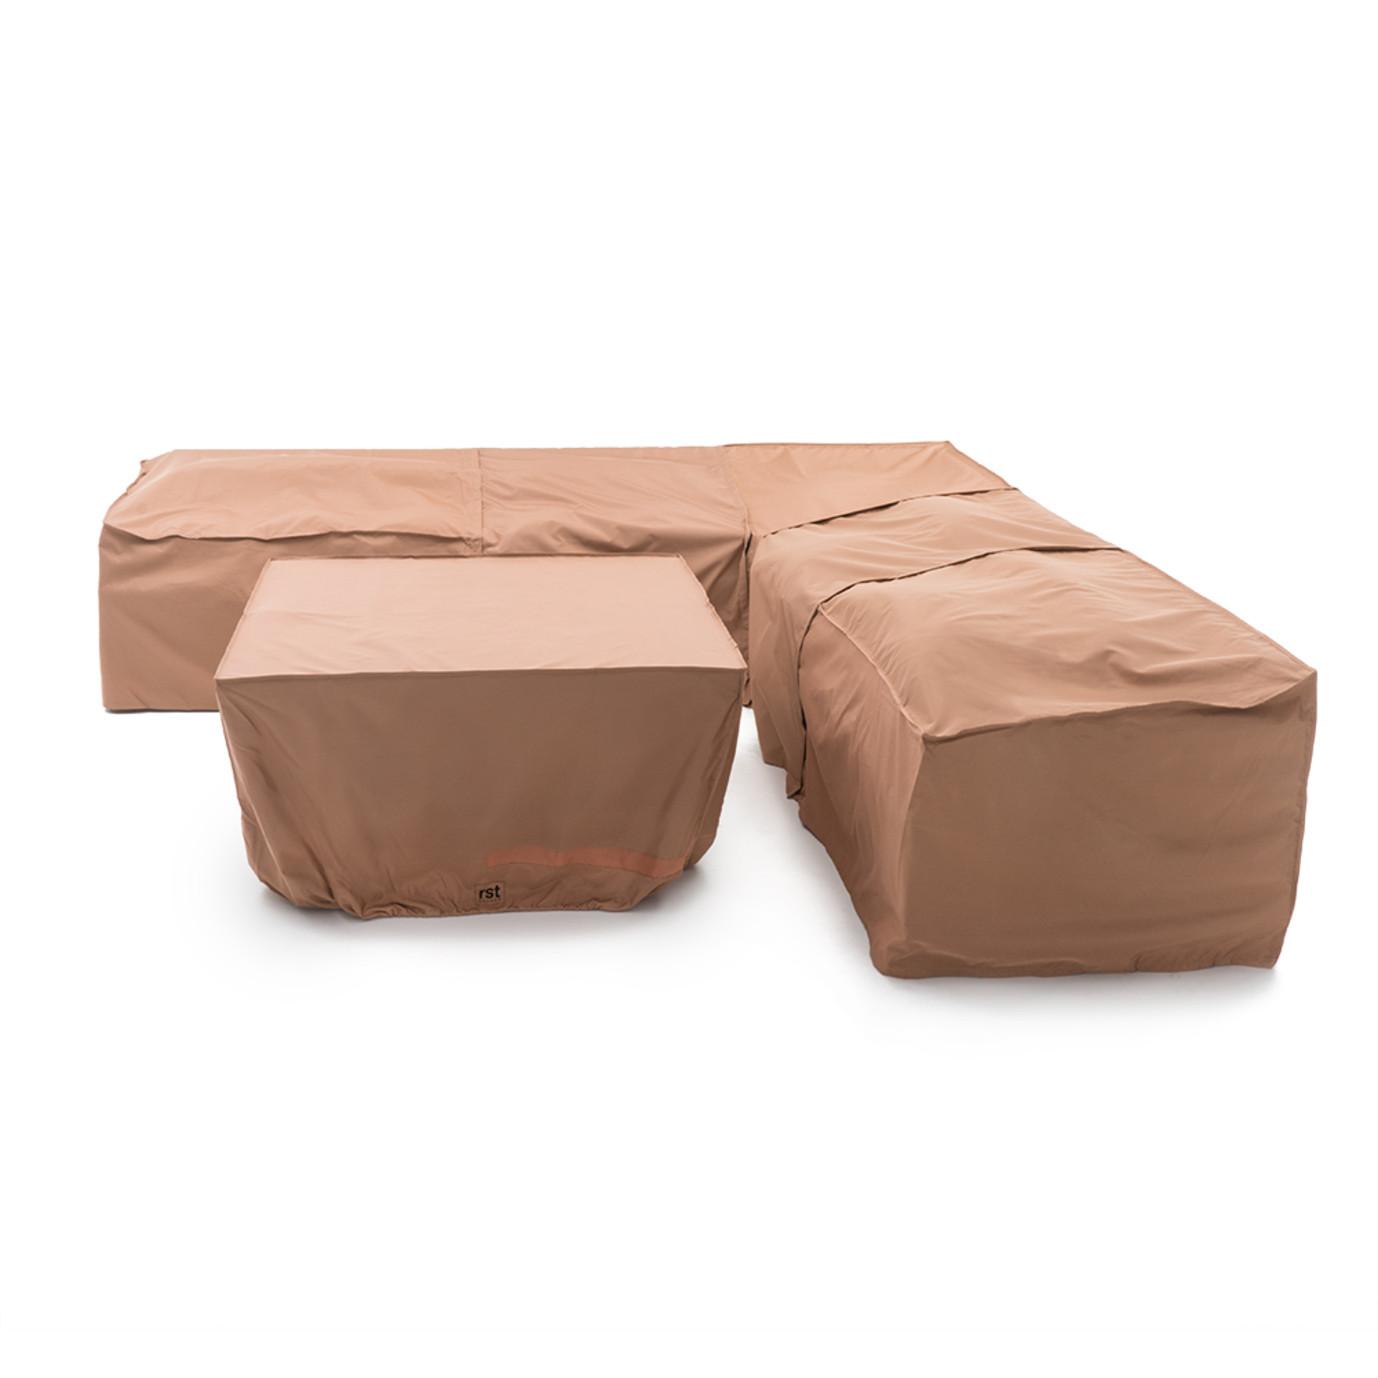 Portofino® Zipper Furniture Covers for 6pc Fire Sectional